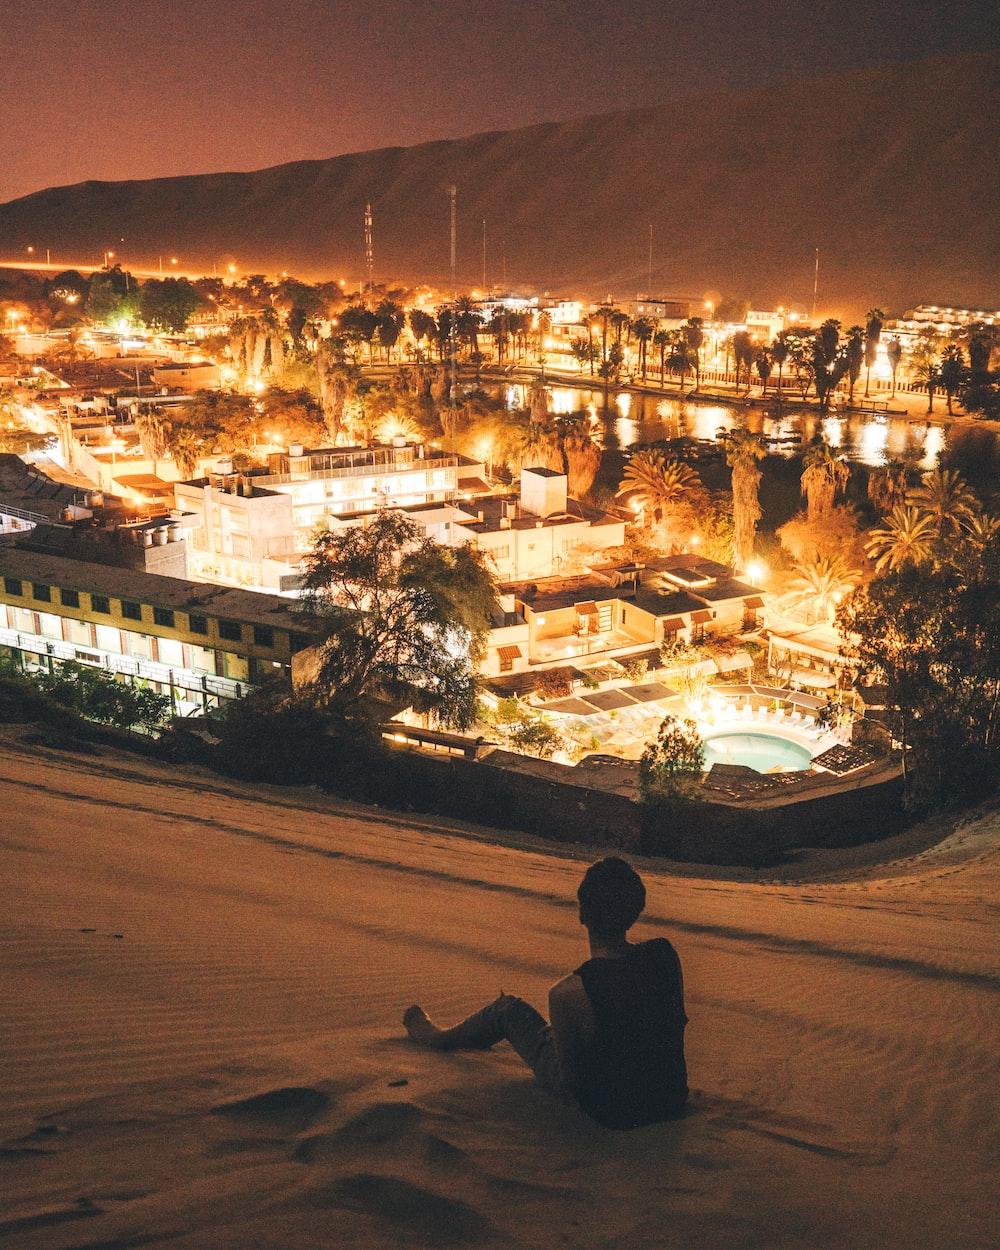 man sitting on sand at night